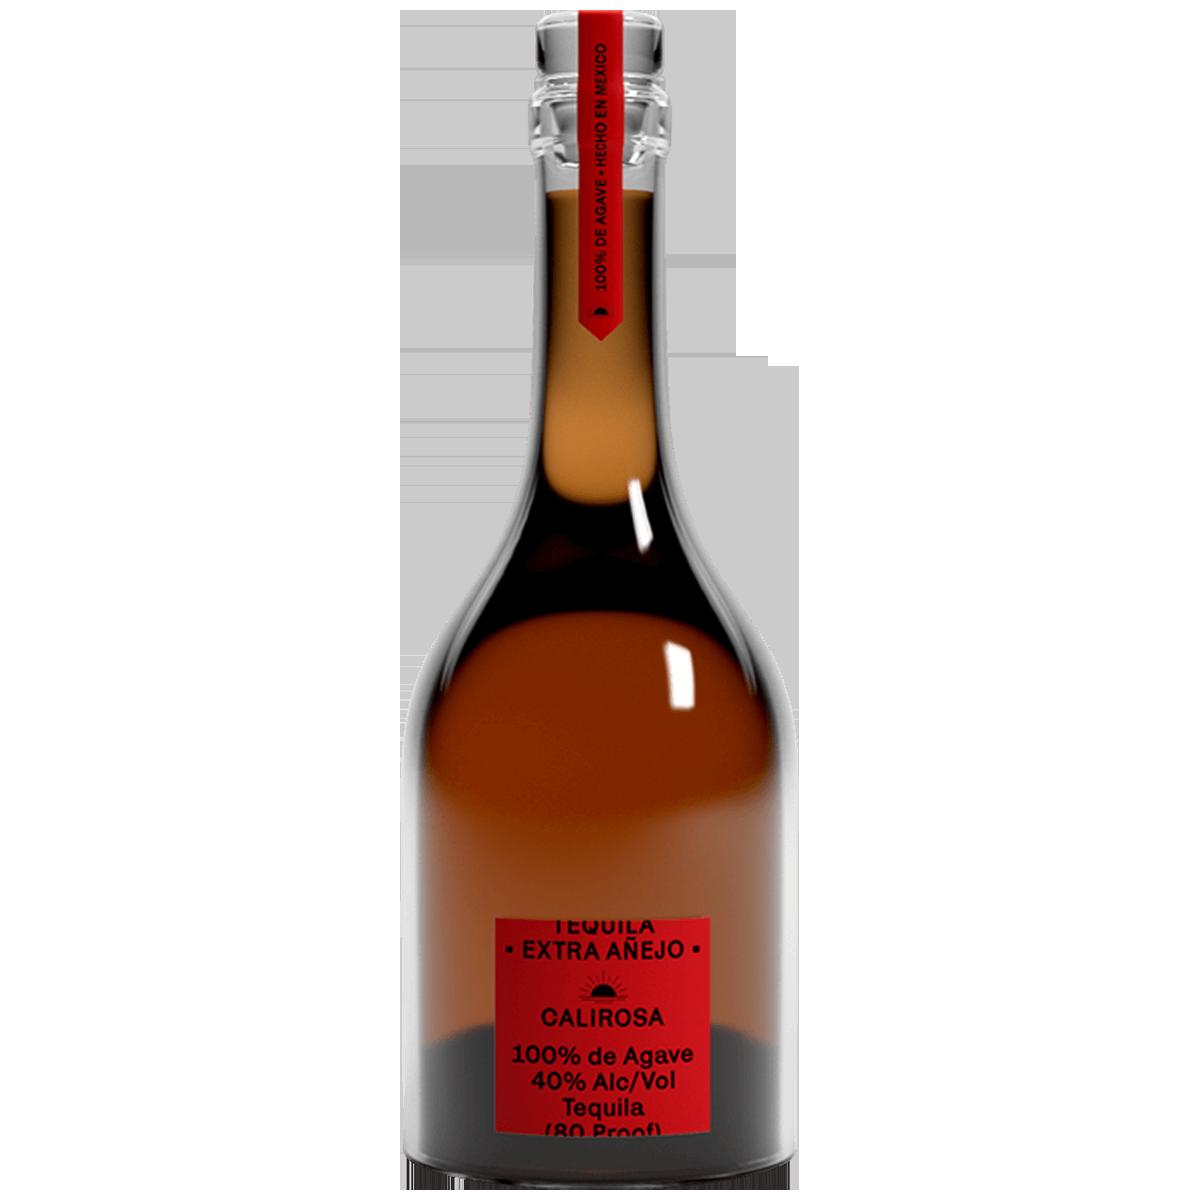 Calirosa Extra Añejo Tequila